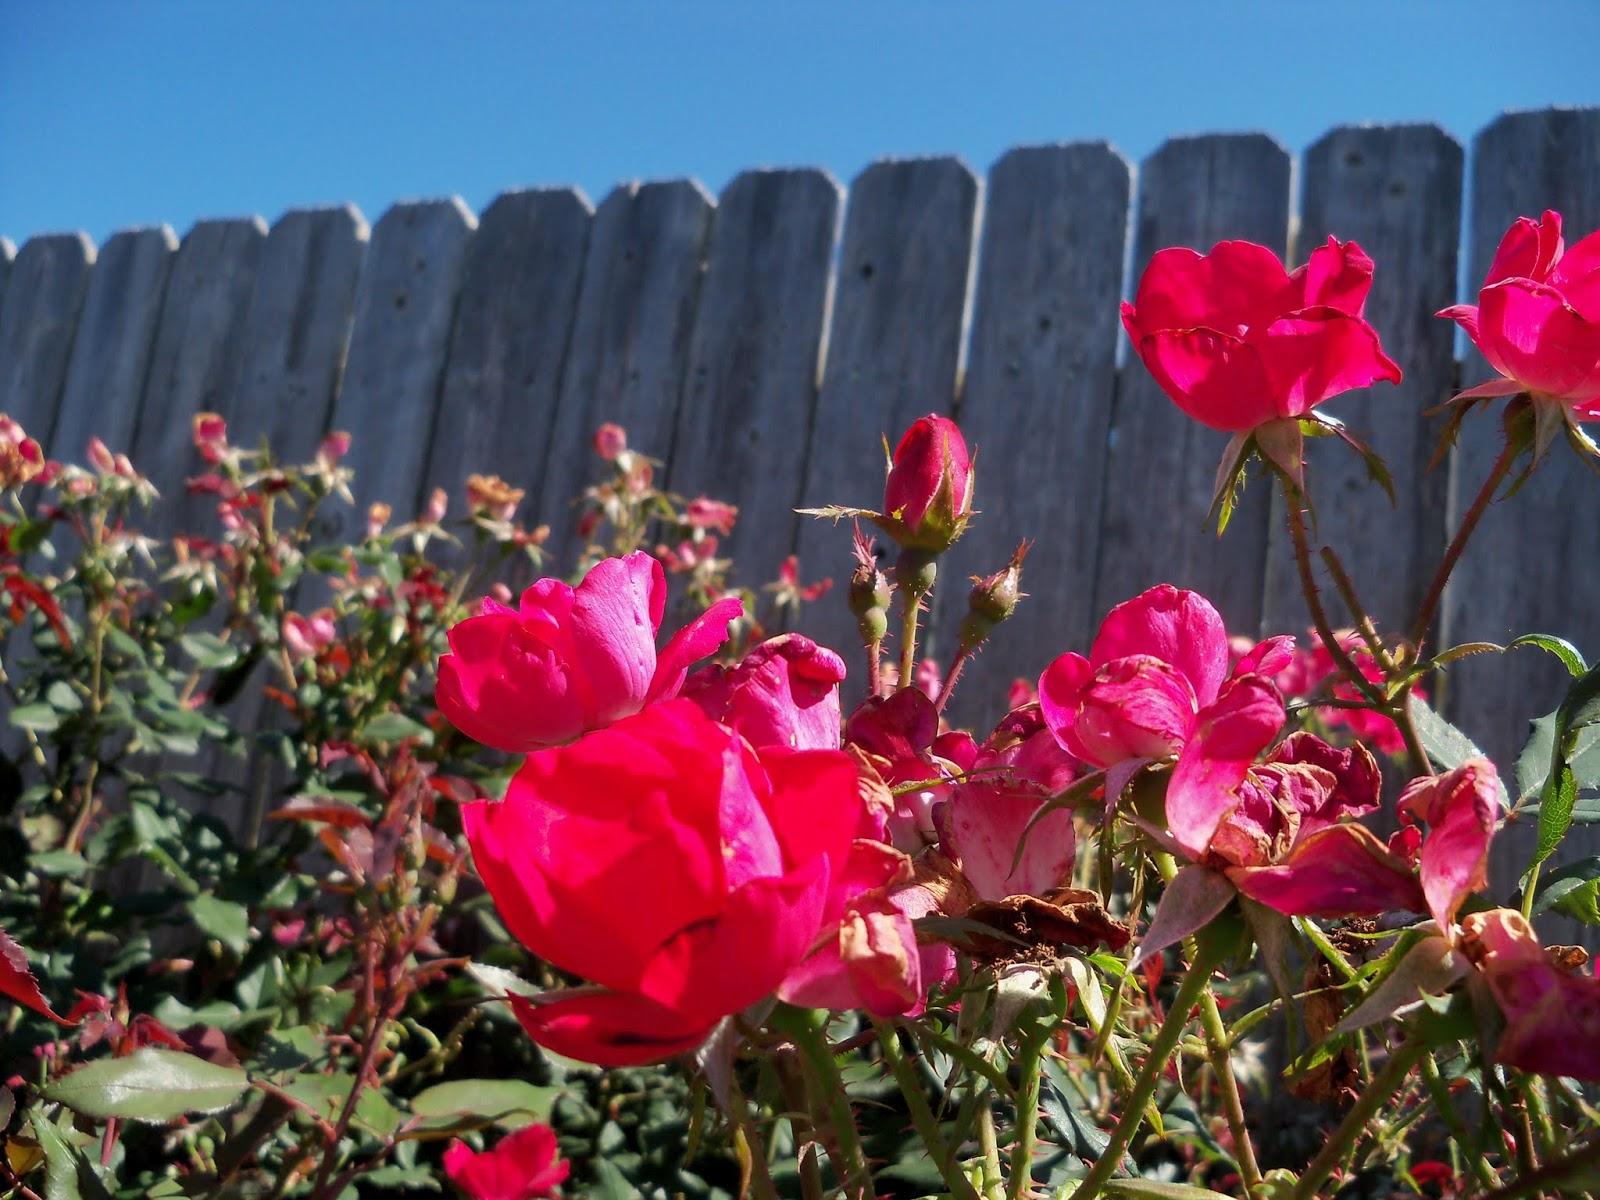 Gardening 2013 - 115_6203.JPG